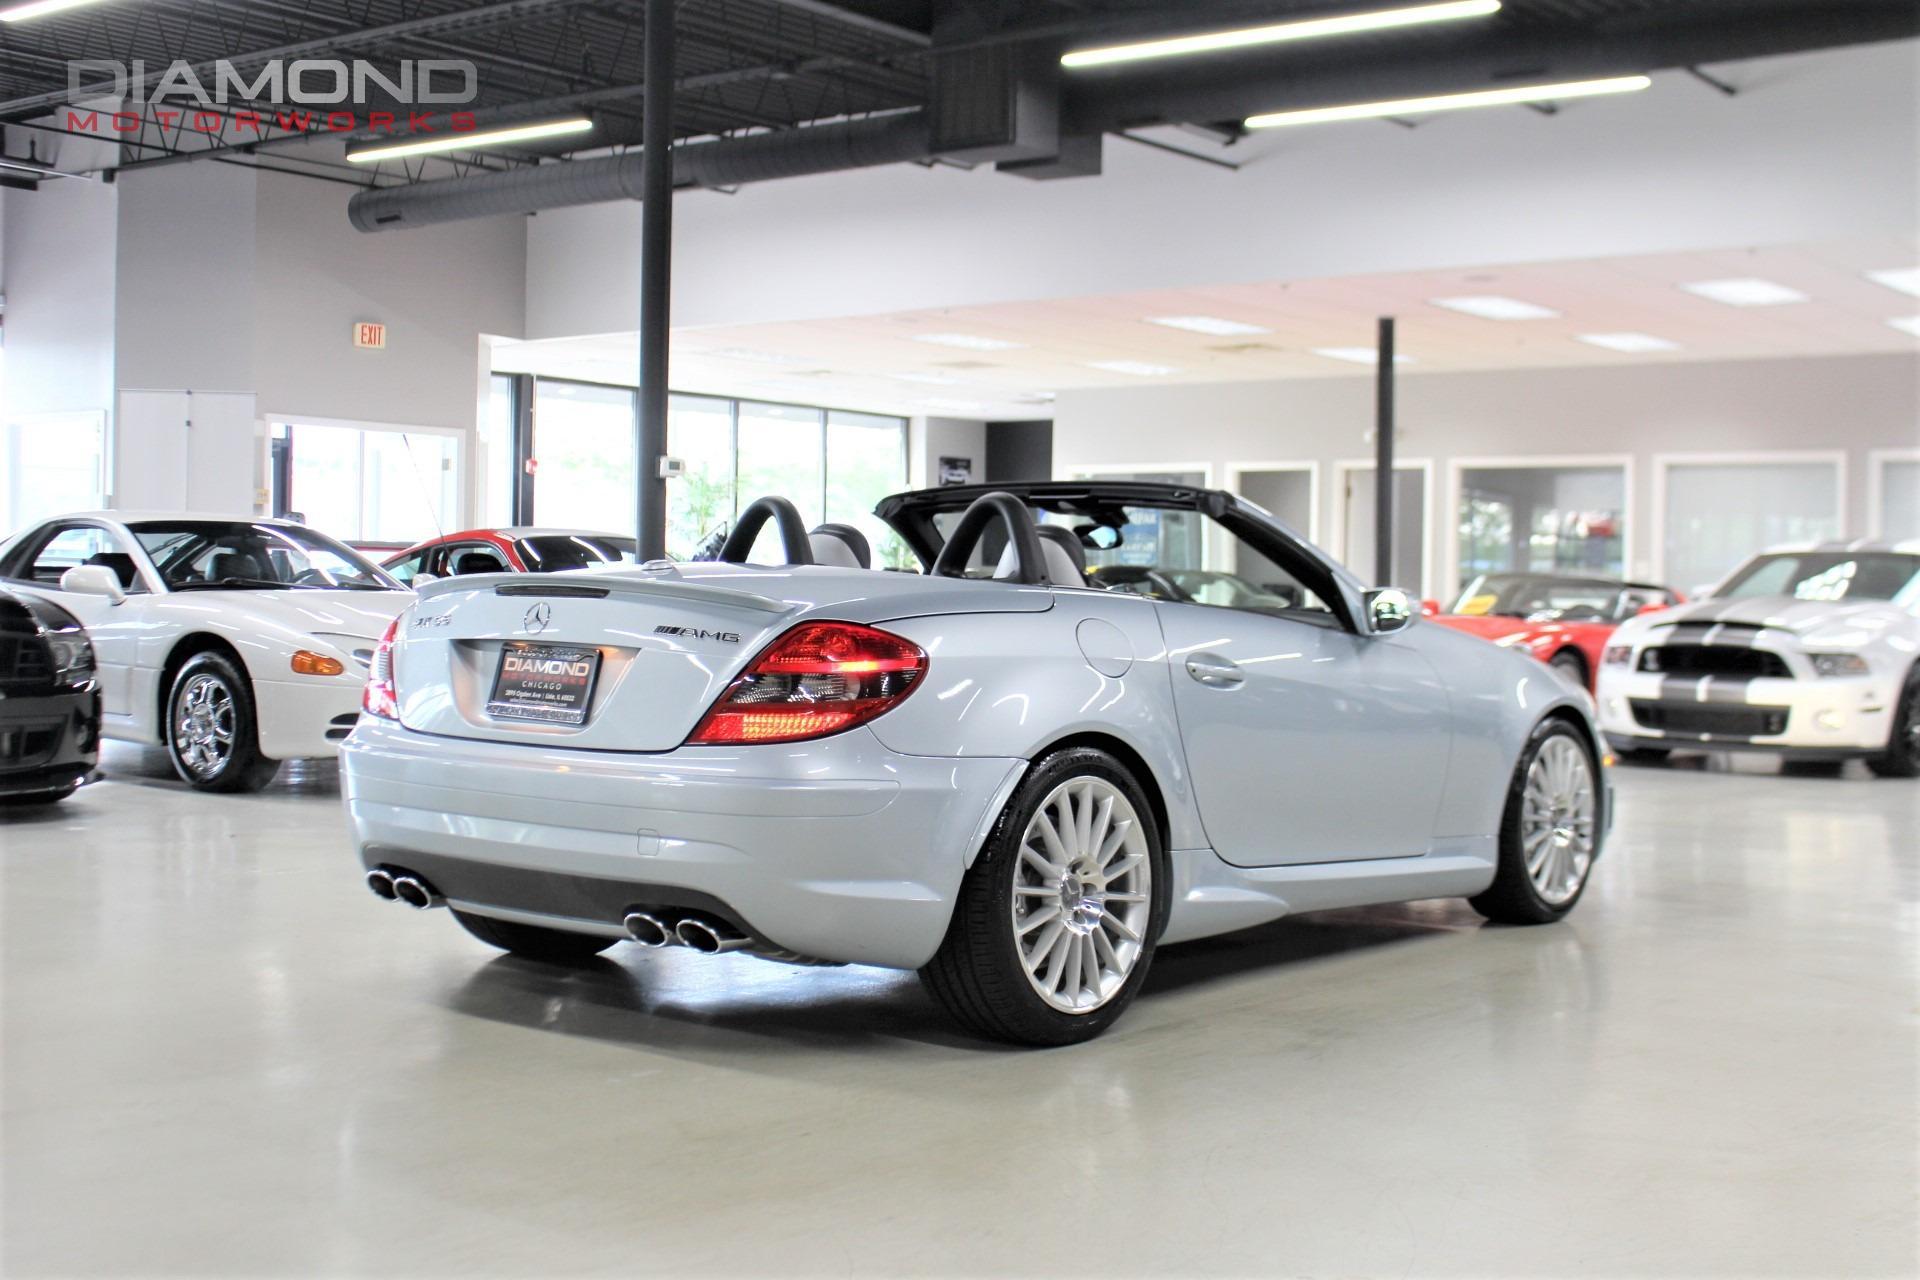 Used-2005-Mercedes-Benz-SLK-SLK-55-AMG